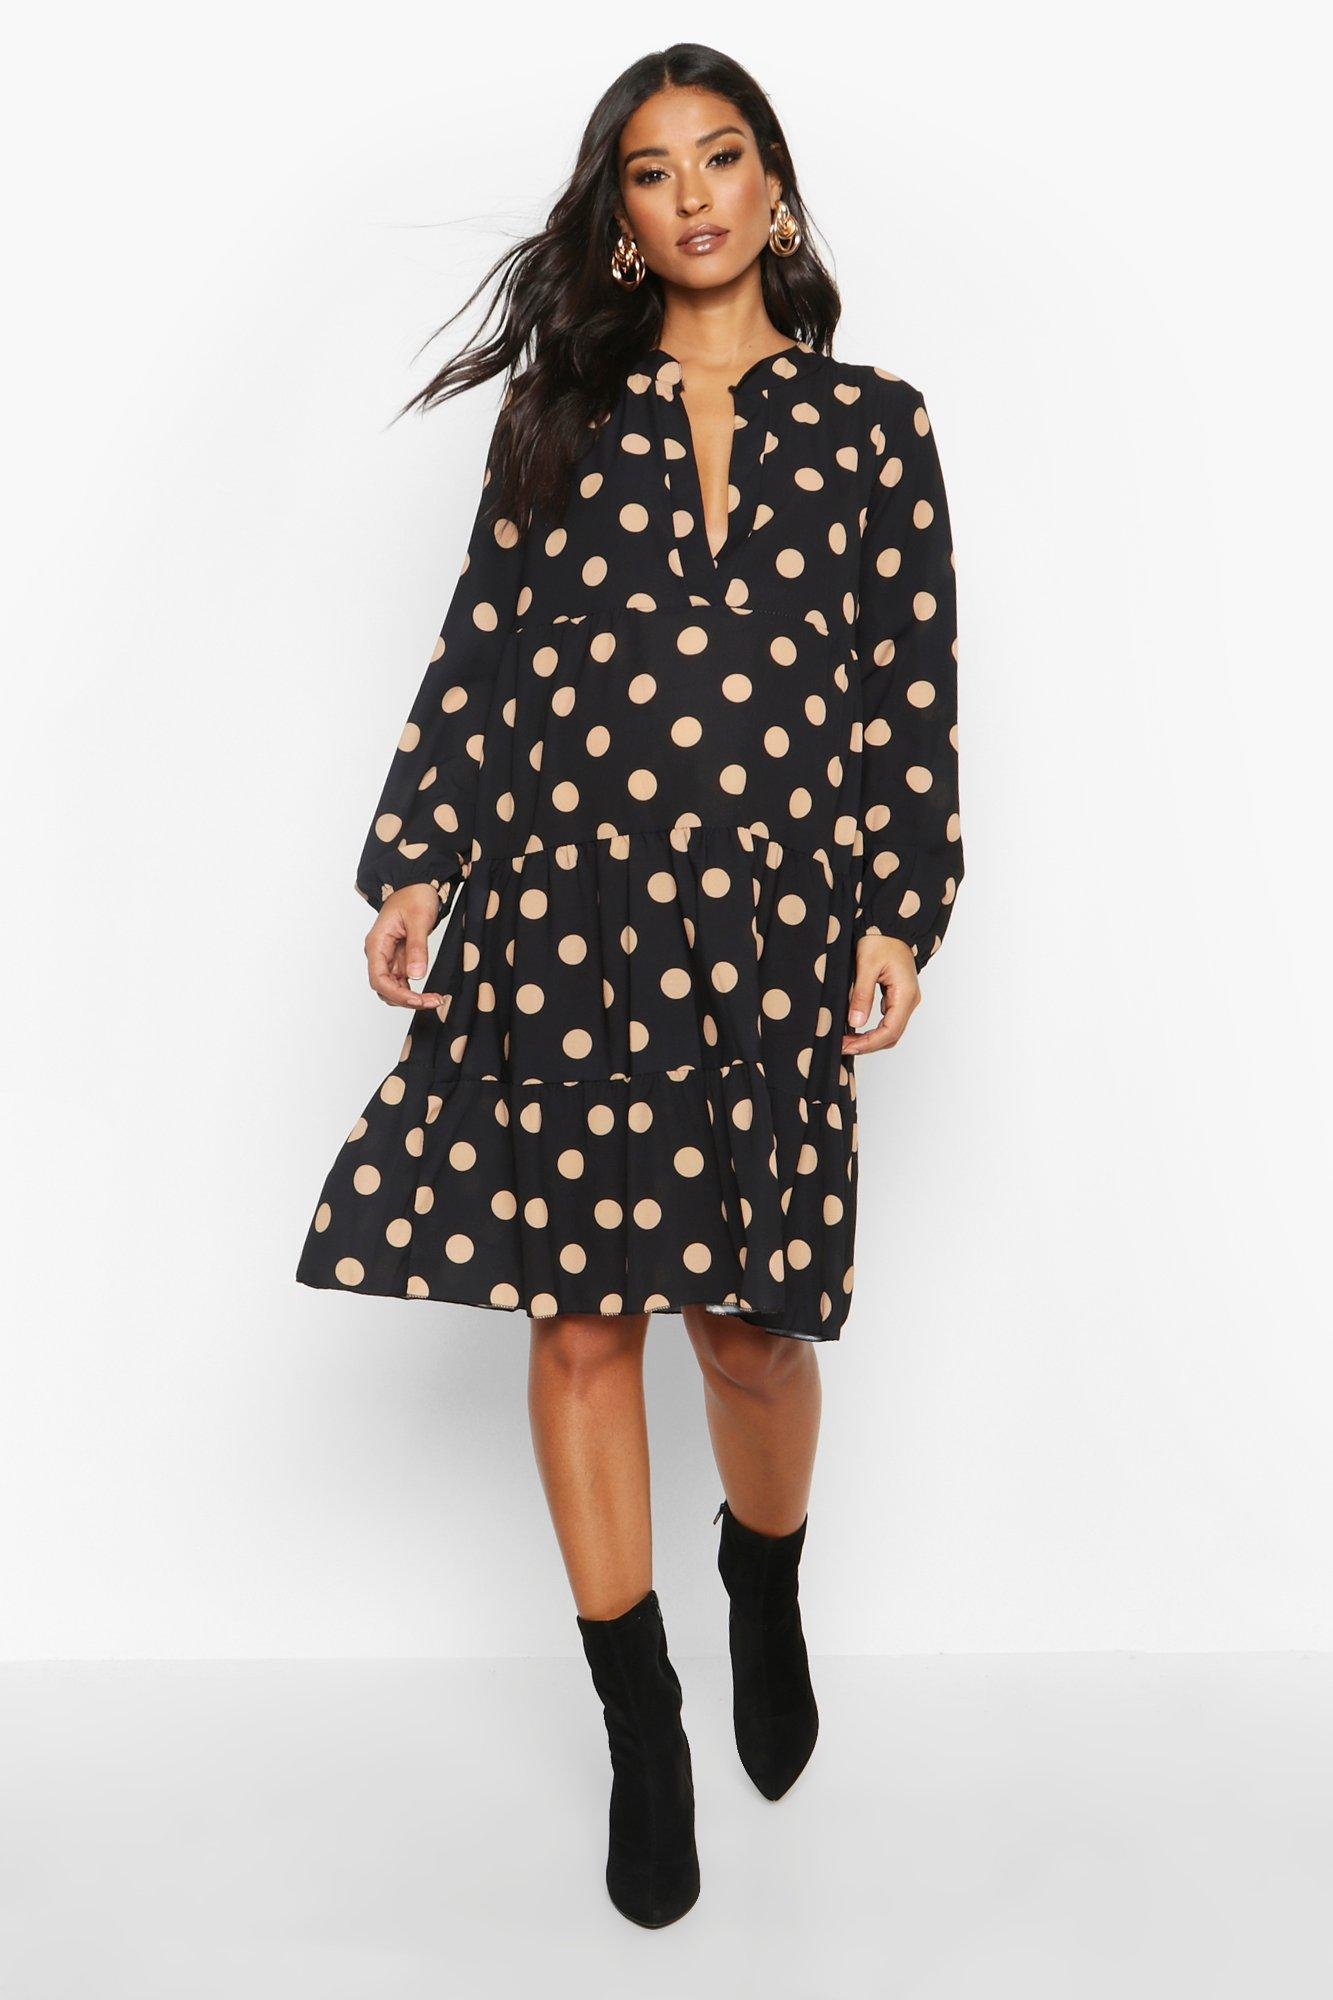 Vintage Style Maternity Clothes Womens Maternity Polka Dot Woven Smock Dress - black - 12 $42.00 AT vintagedancer.com